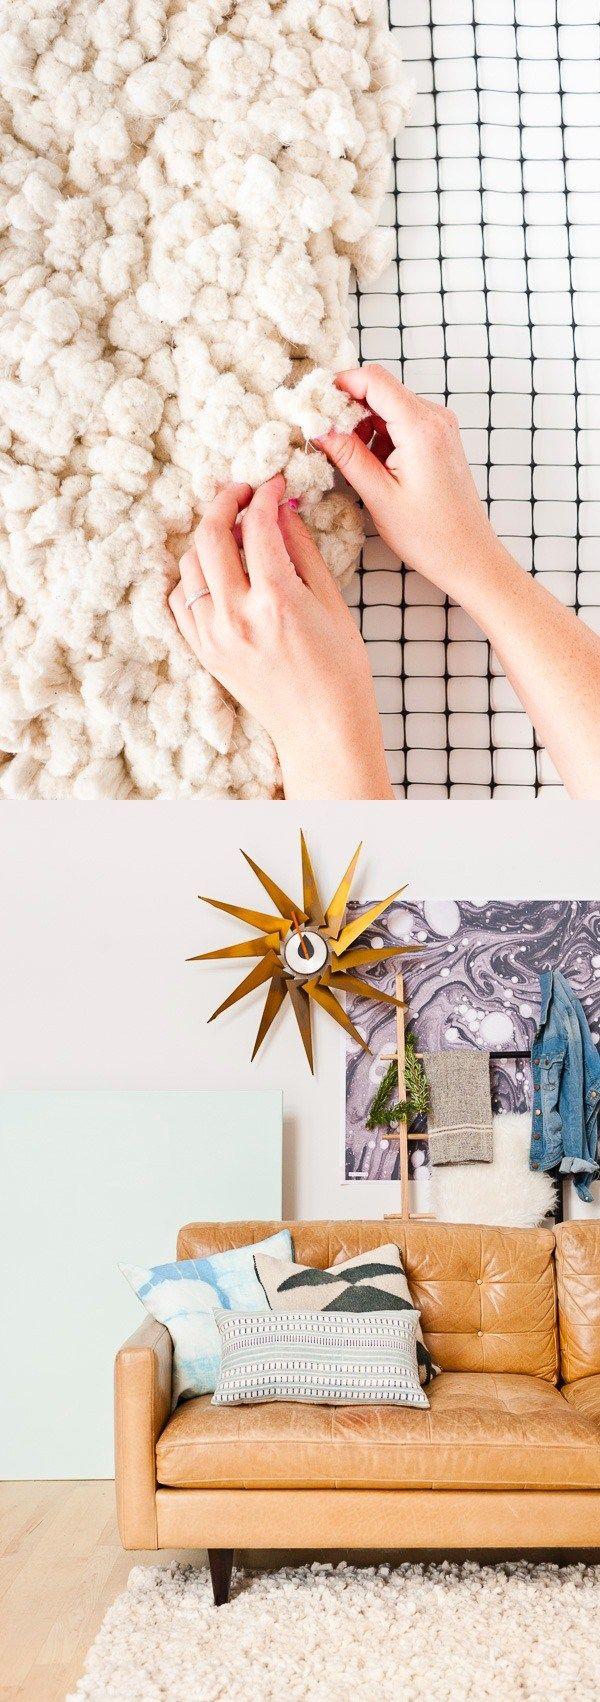 Cómo tejer una alfombra fácilmente - papernstitchblog.com - DIY Large-Scale Rug From Scratch